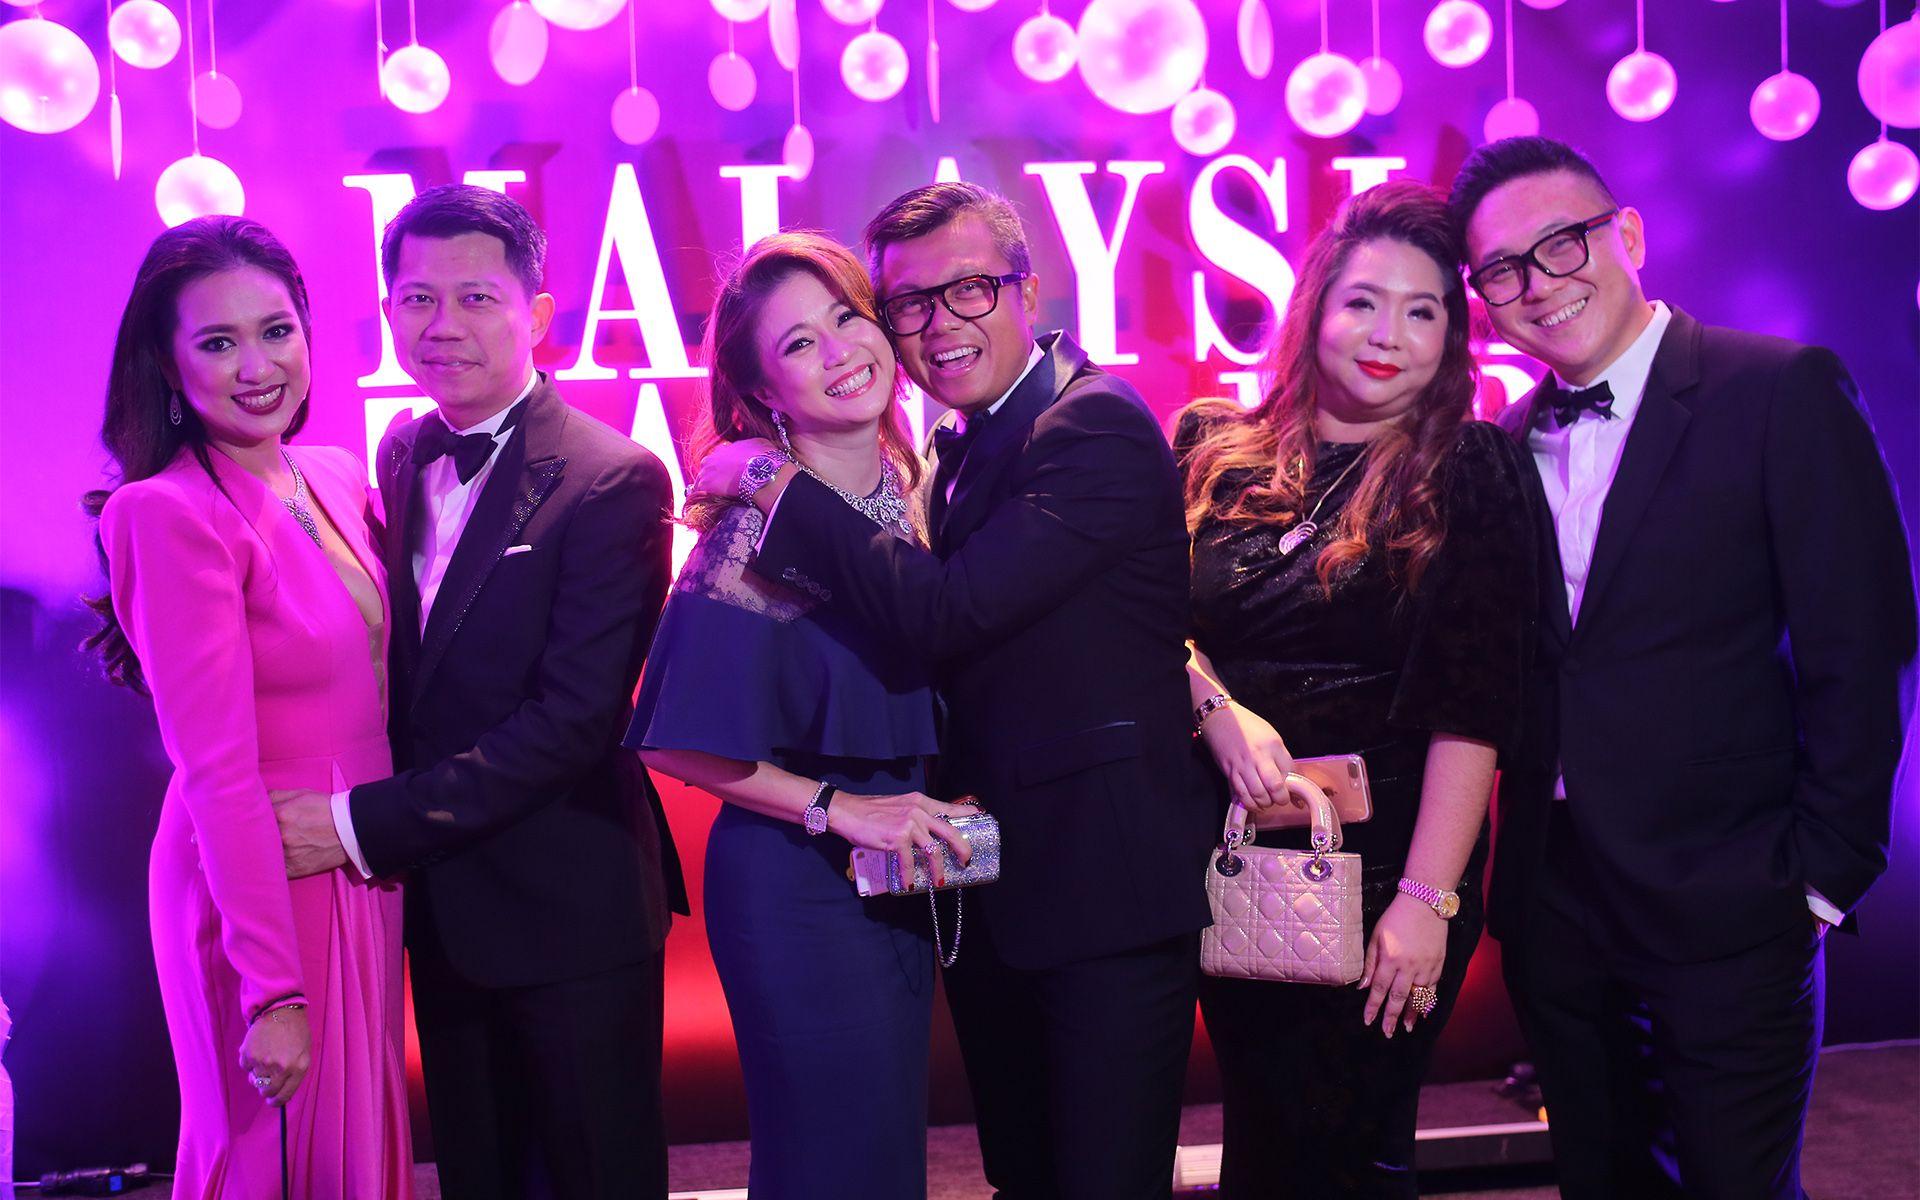 Datin Yvette Kang, Datuk Michael Tang, Mariam Teh, Ewan Saufi Abas, Yap Ai Leen and Foo Ken Vin